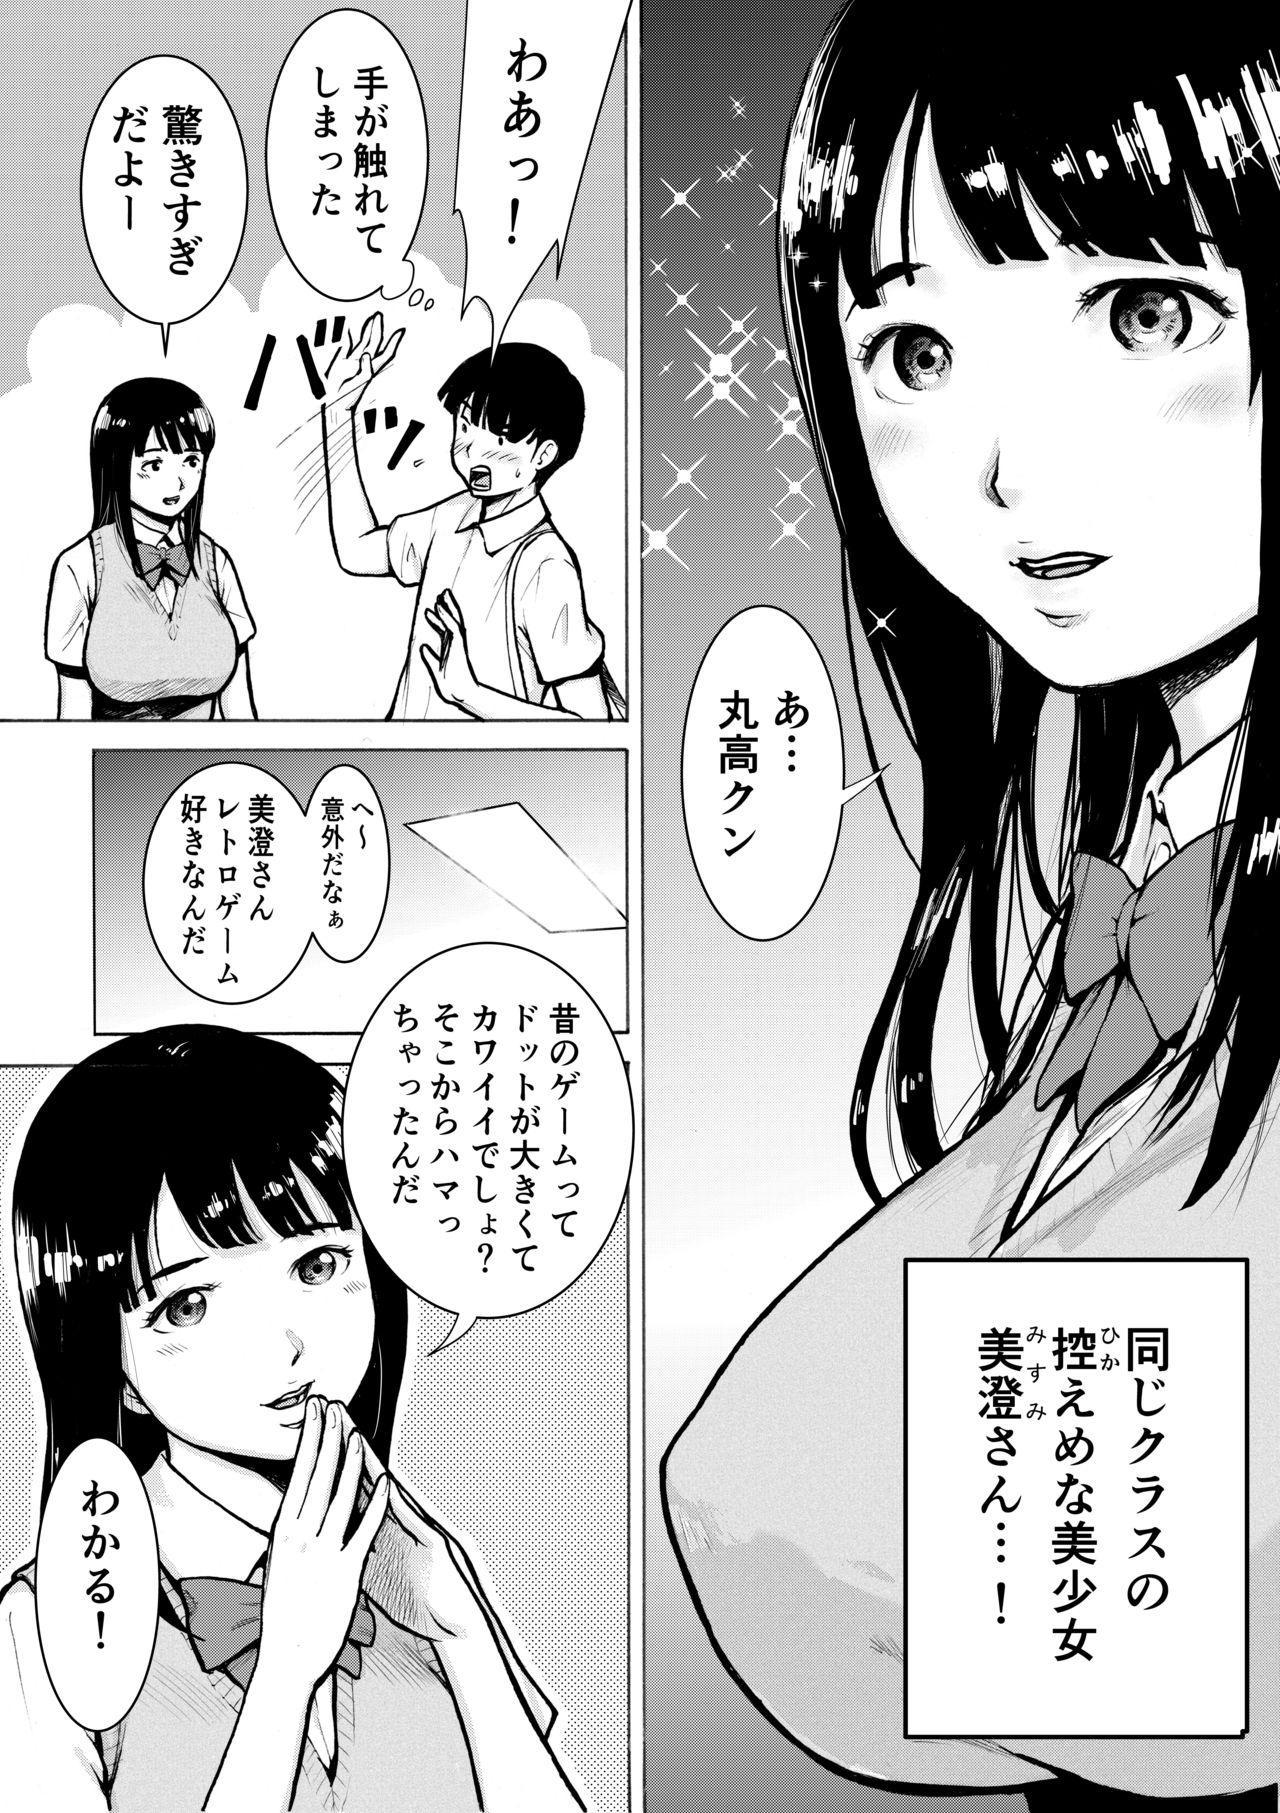 Retro Girl 3